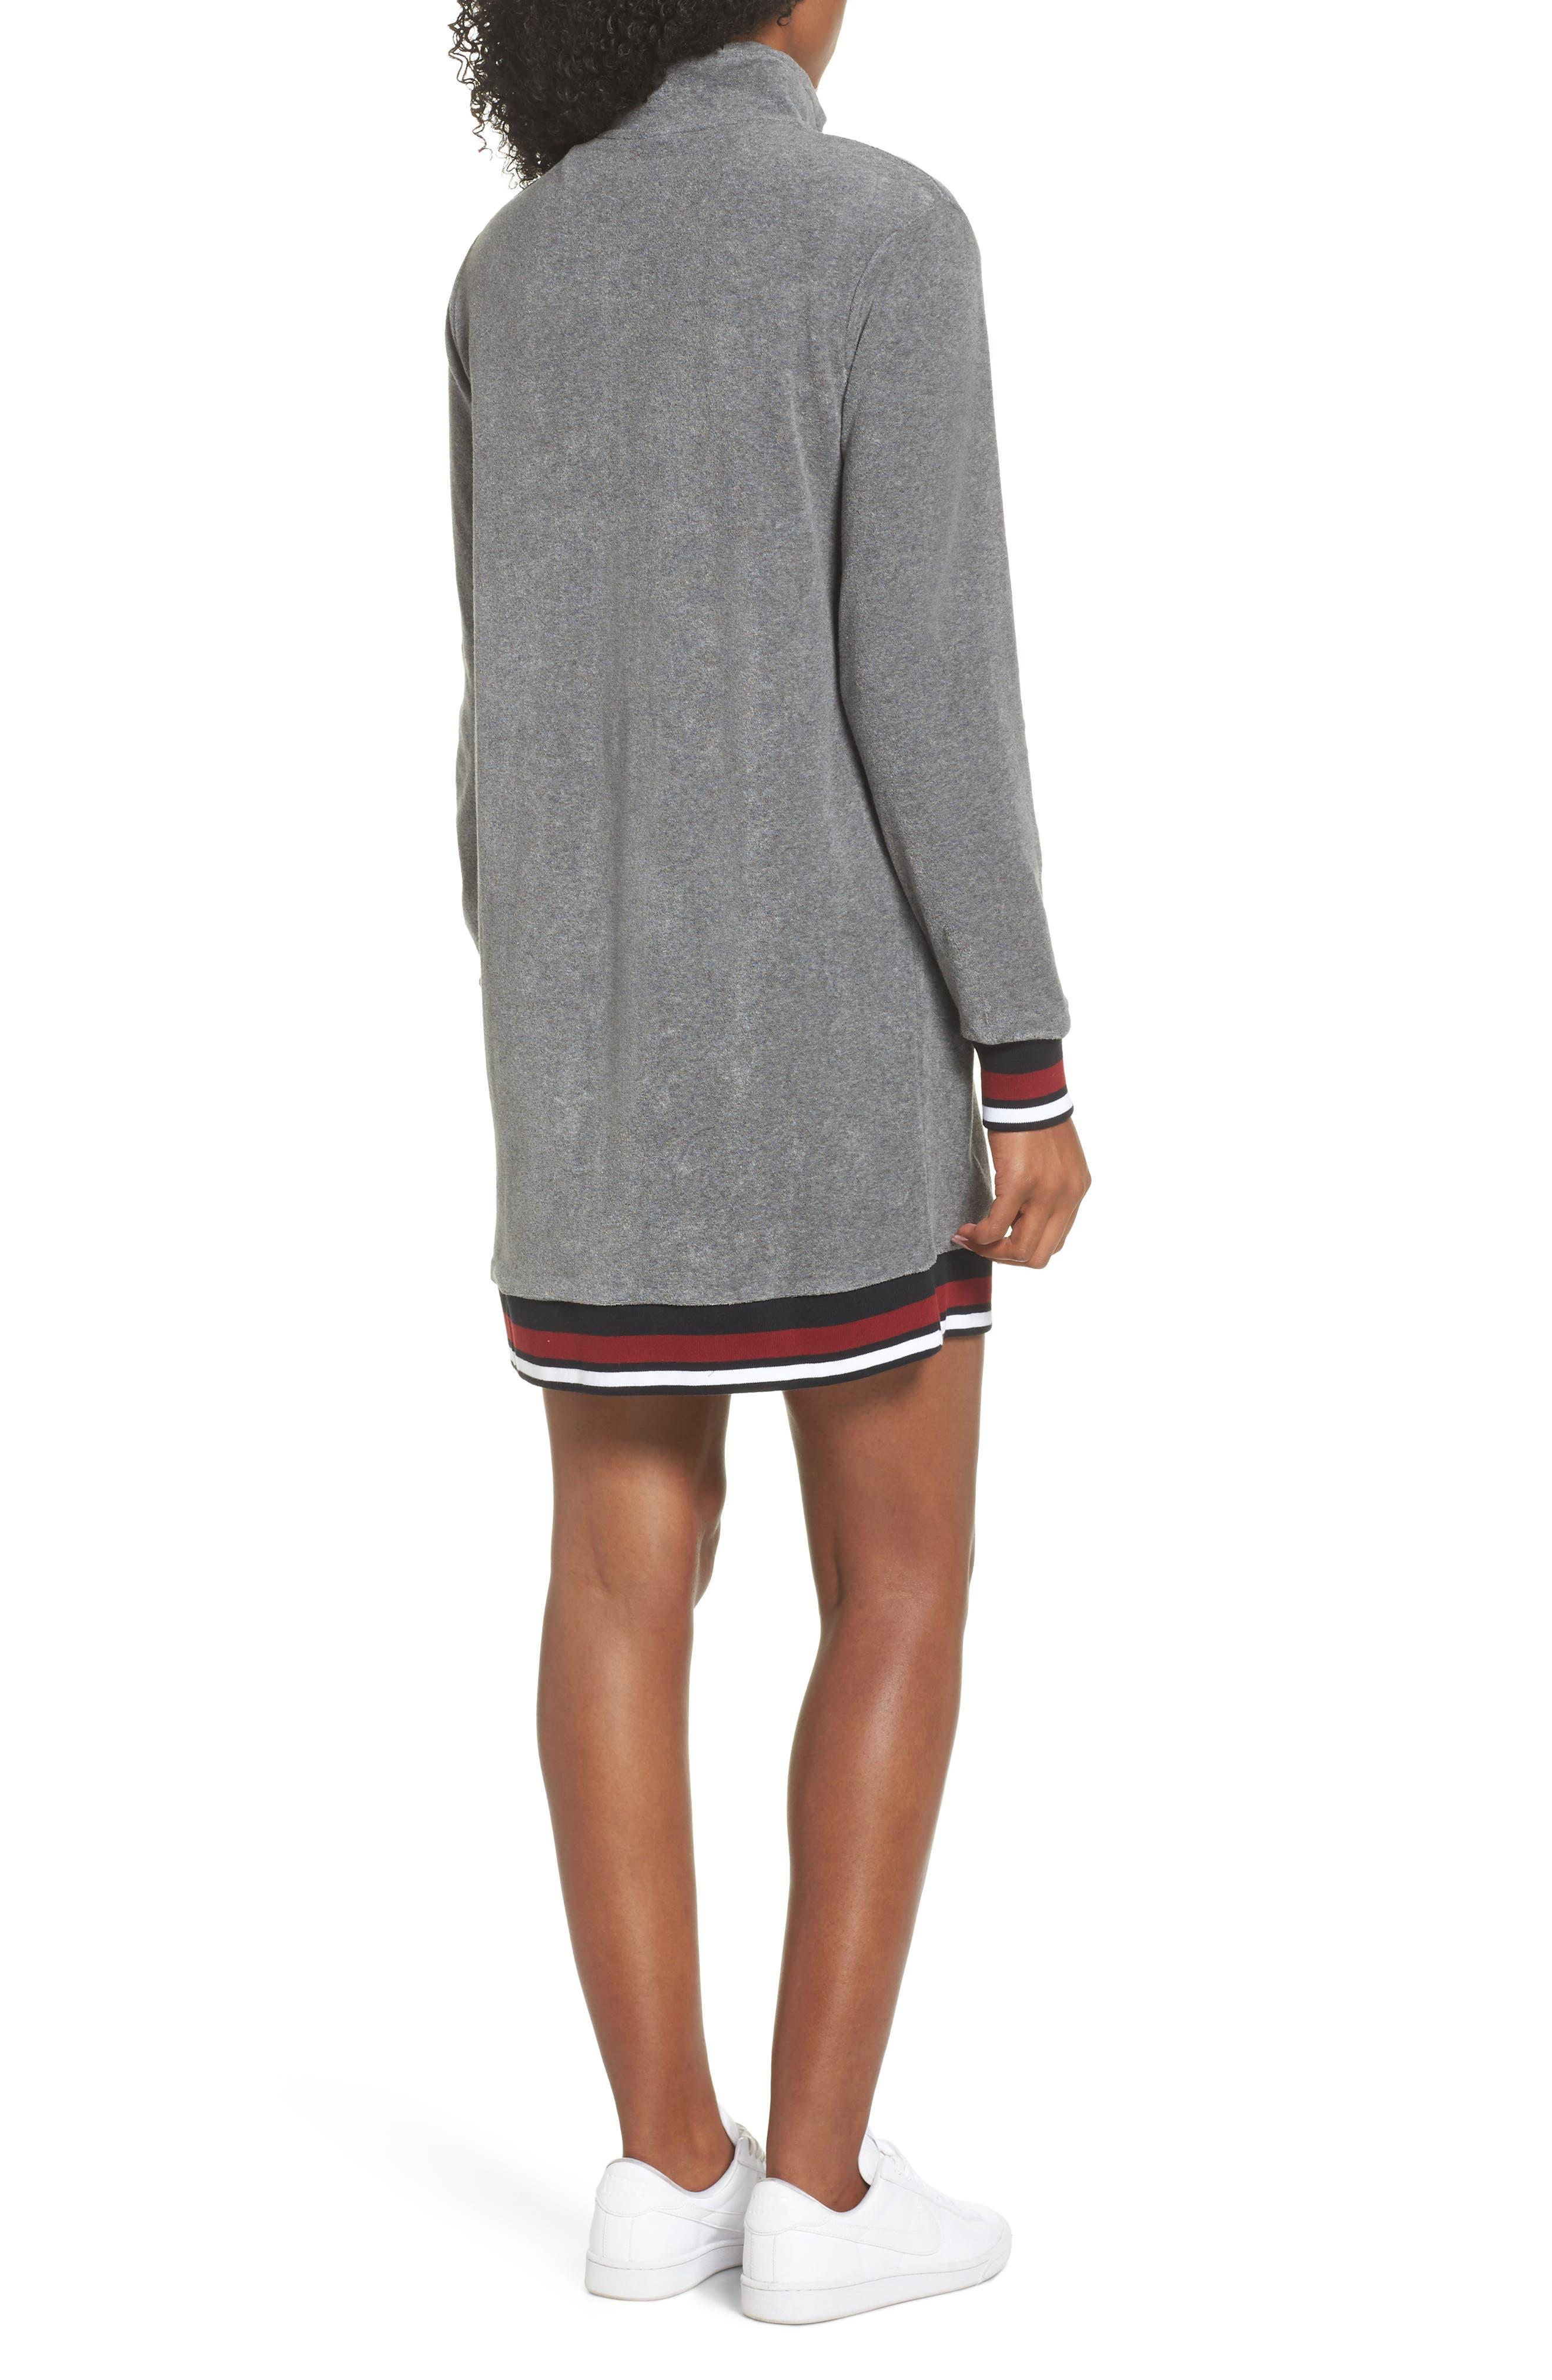 Sportswear French Terry Sweatshirt Dress,                             Alternate thumbnail 2, color,                             020